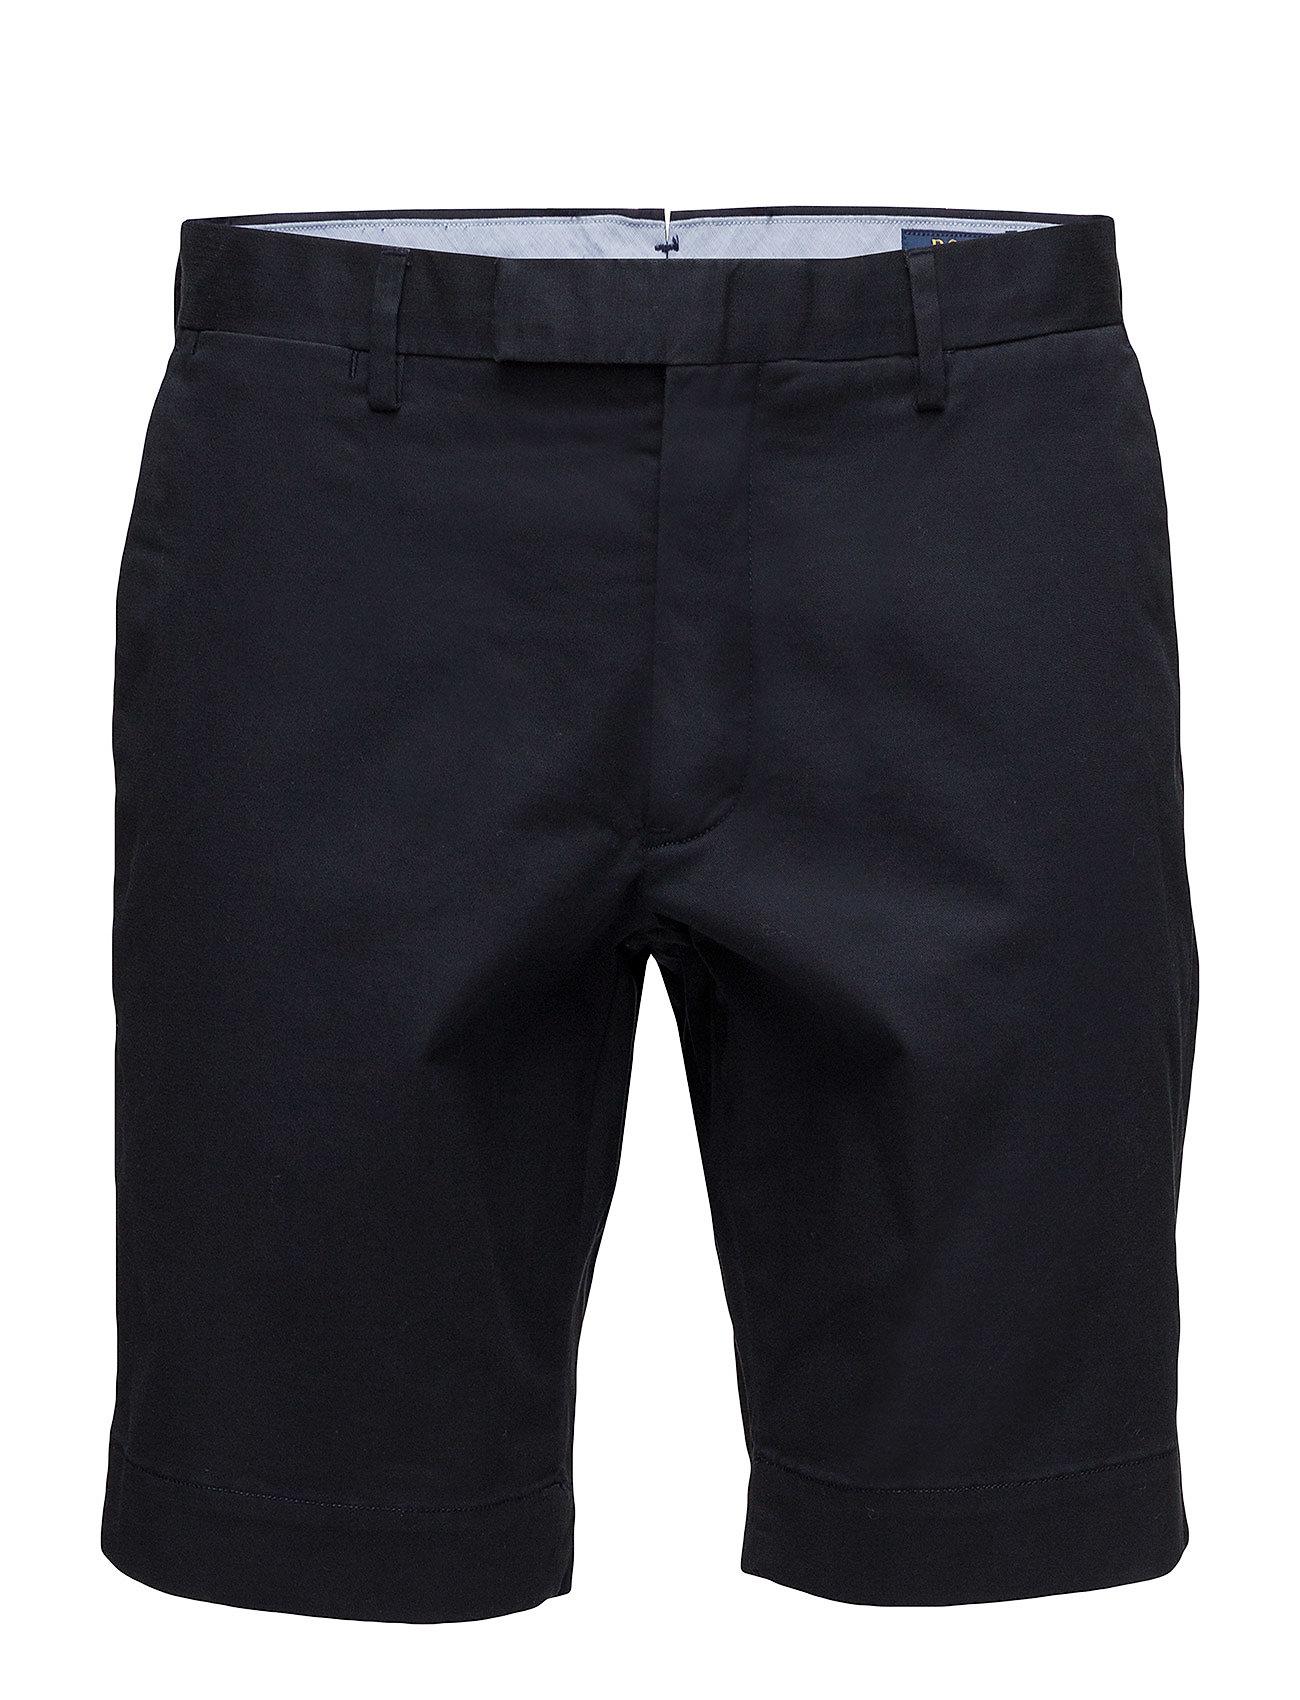 Polo Ralph Lauren Stretch Slim Fit Chino Short - AVIATOR NAVY